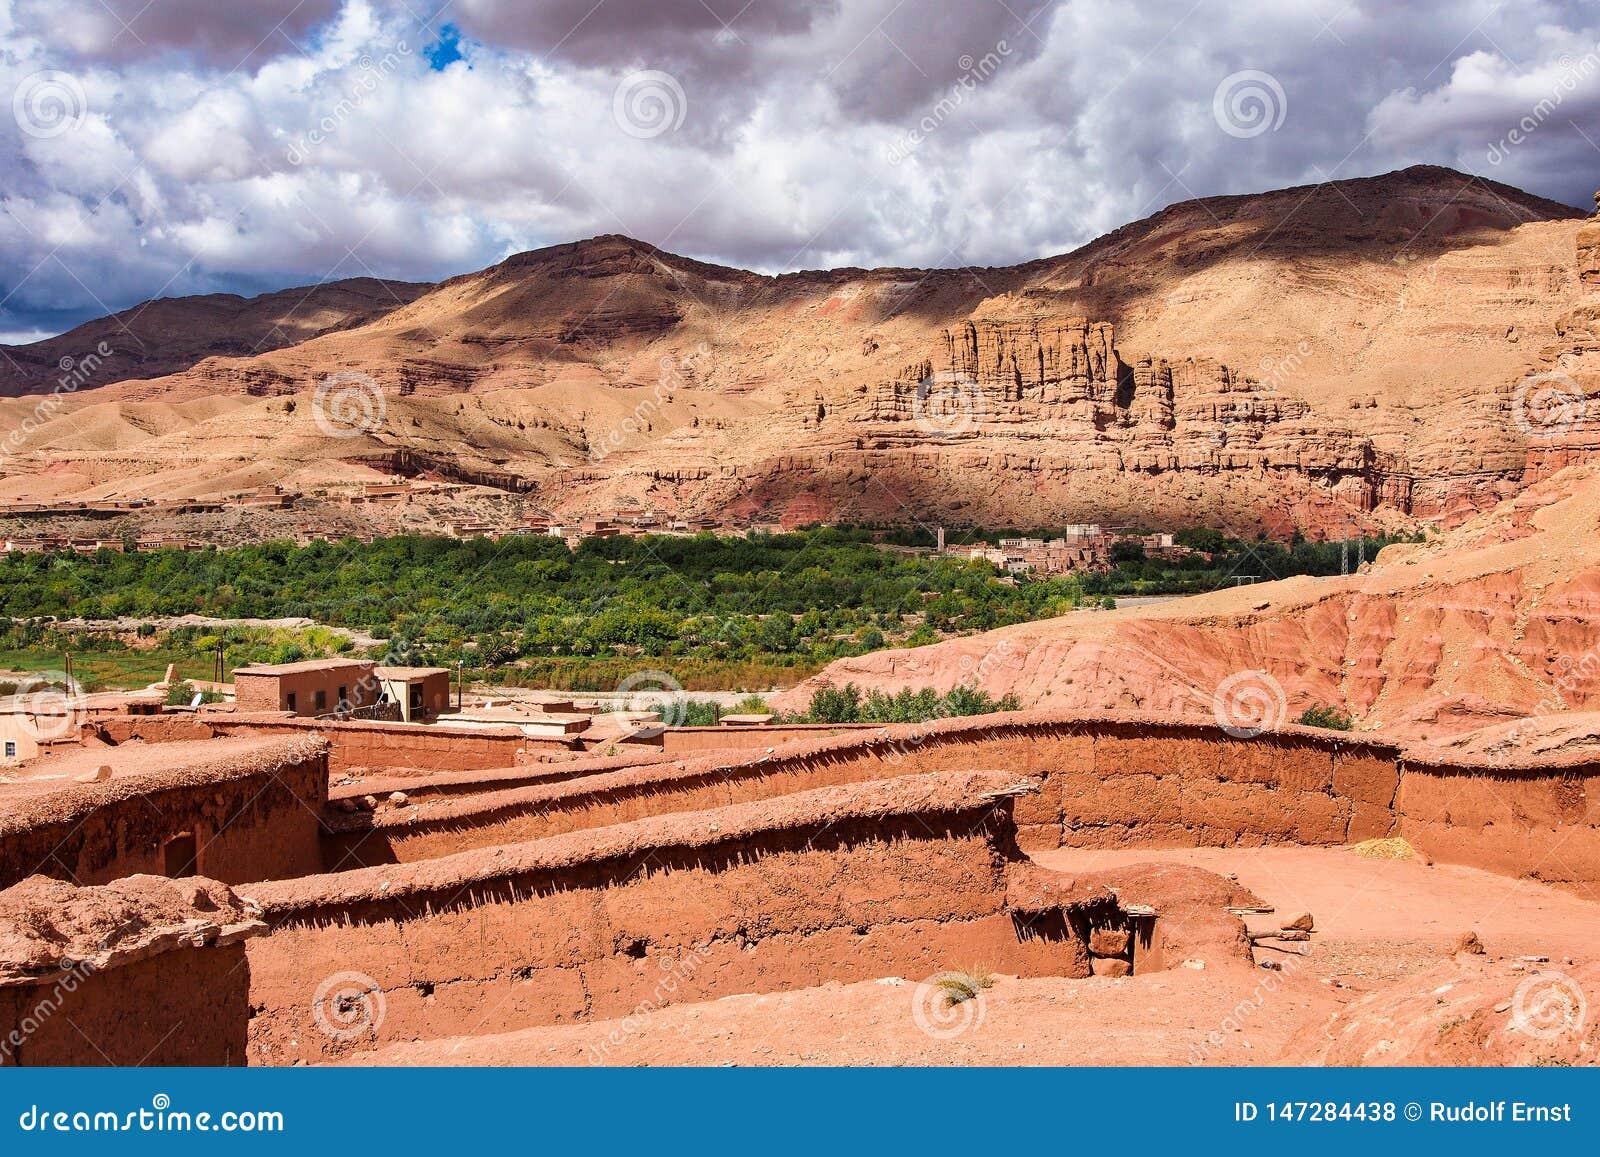 Mooie Rose Valley - Vallee des Roses, dichtbij Ouarzazate, Marokko